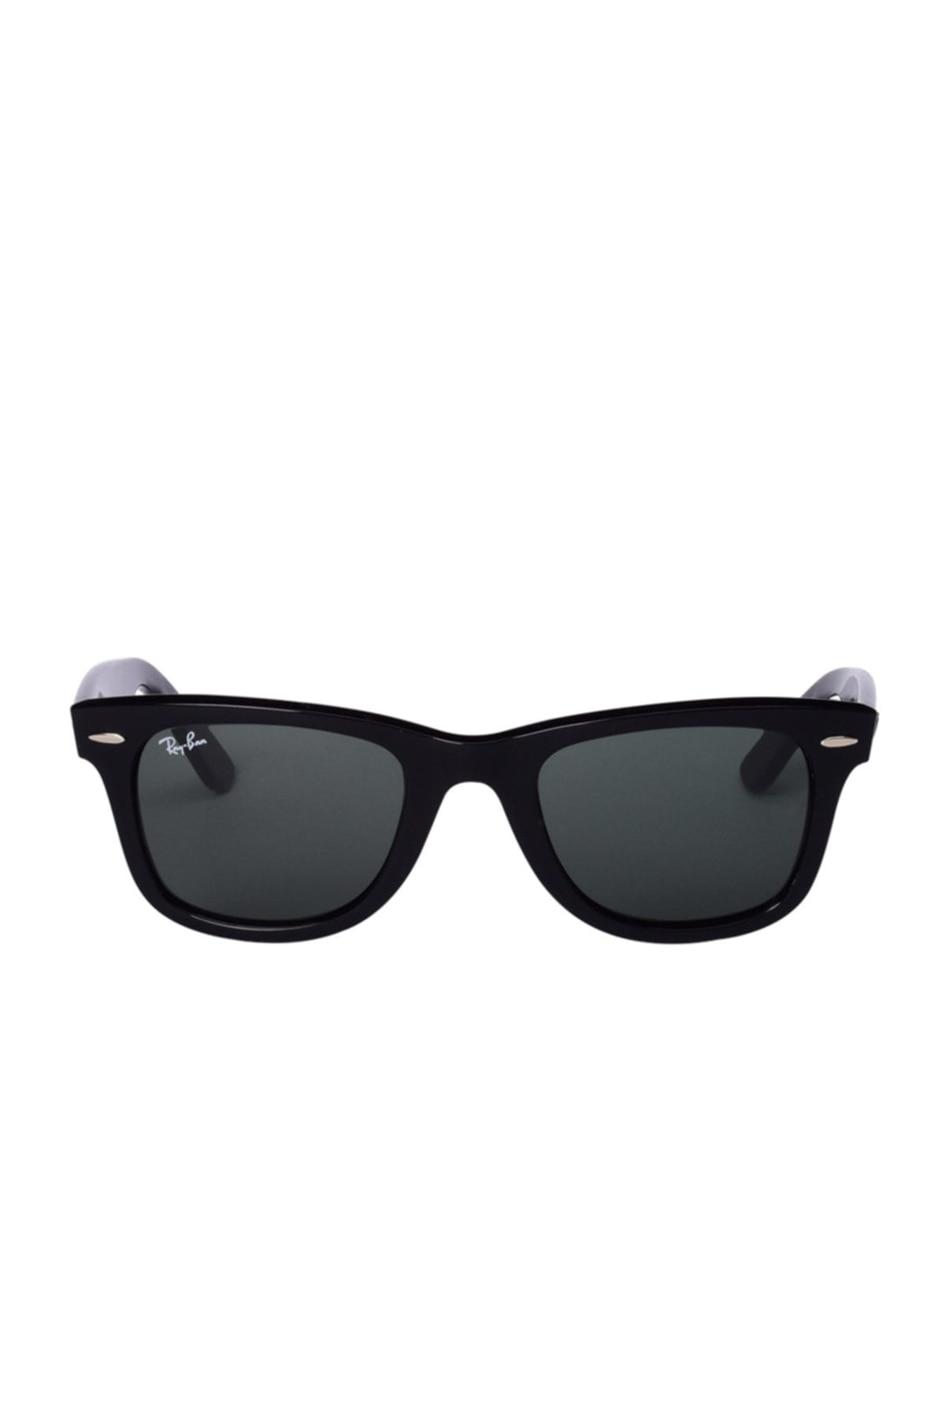 Ray-ban óculos de sol masculino feminino proteção uv lente acessórios 100% original óculos de sol rb2140 901 50